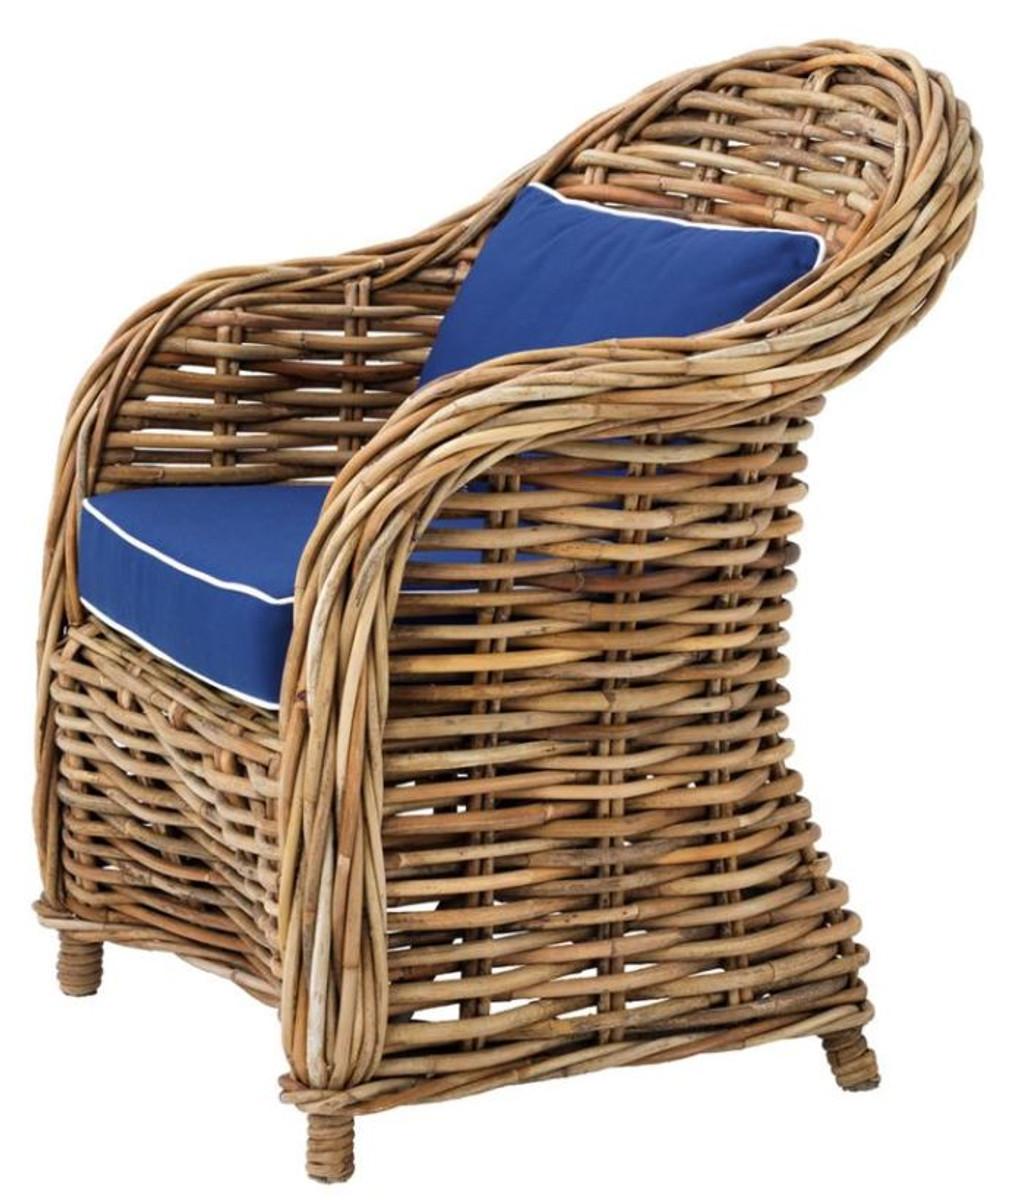 Casa padrino designer rattan sessel 70 x 70 x h 88 cm - Rattanmobel wohnzimmer ...